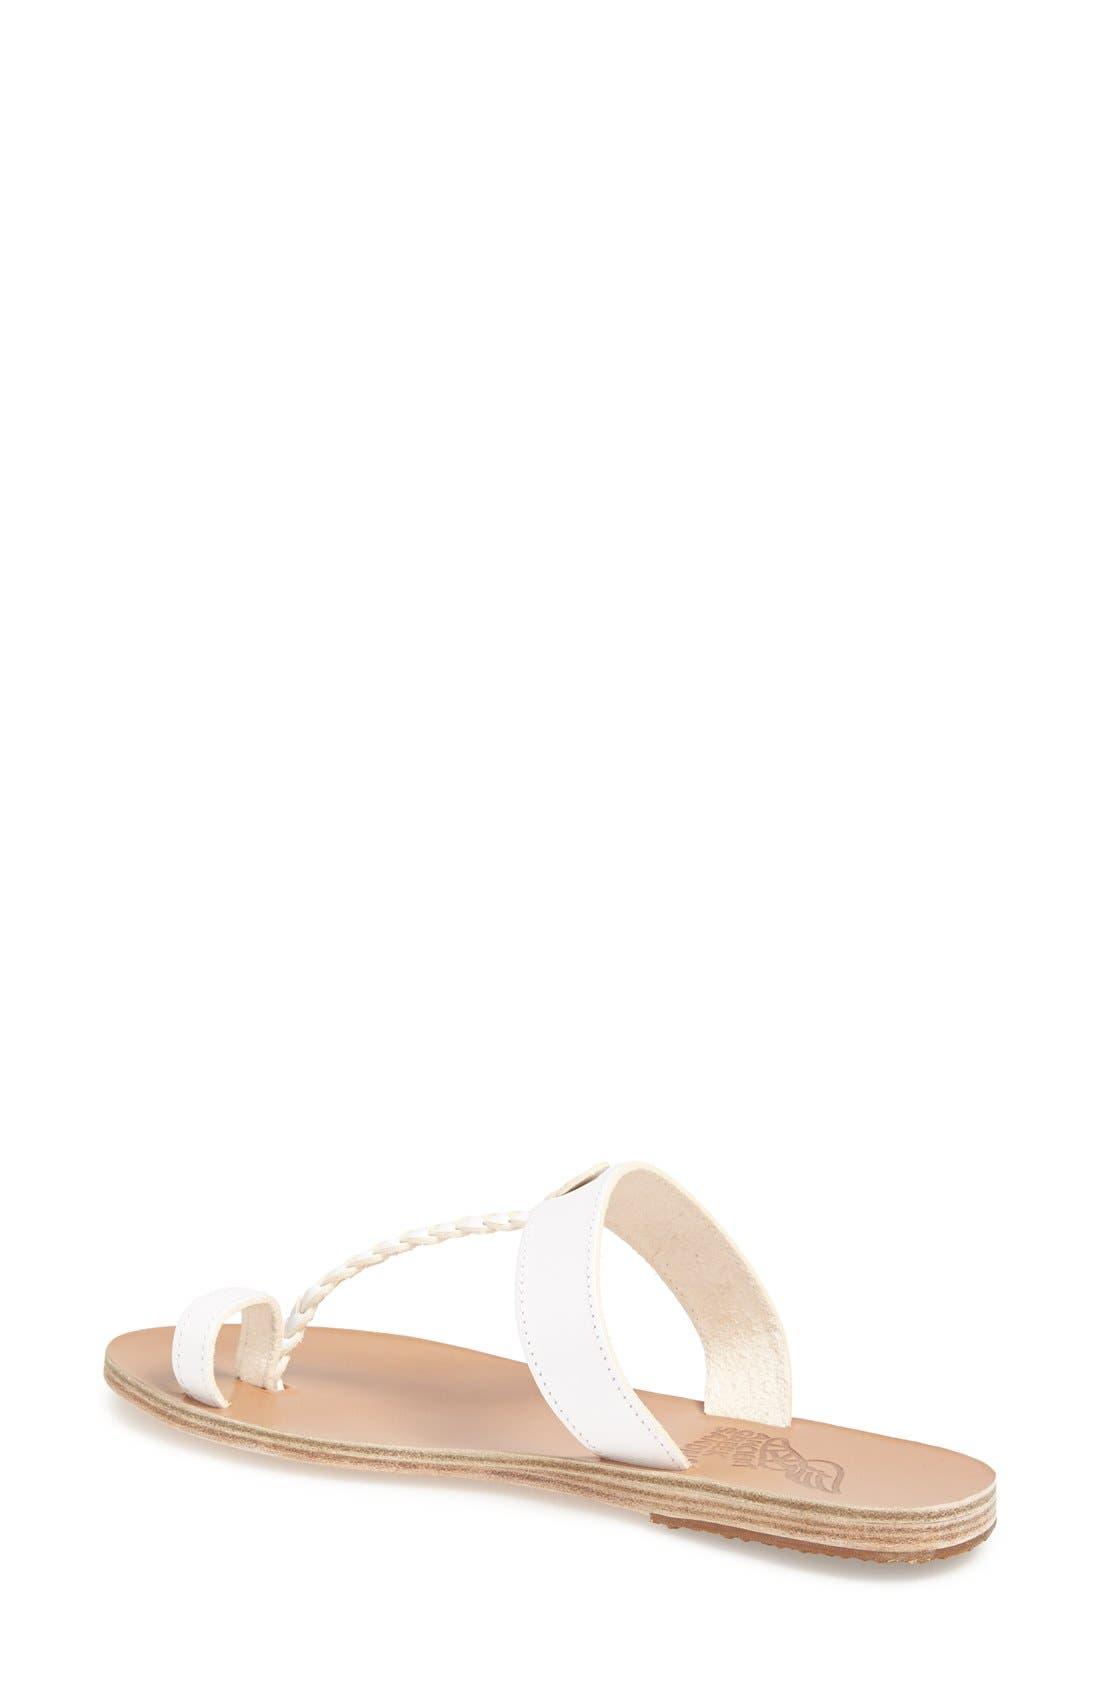 Alternate Image 2  - Ancient Greek Sandals 'Melpomeni' Leather Sandal (Women)